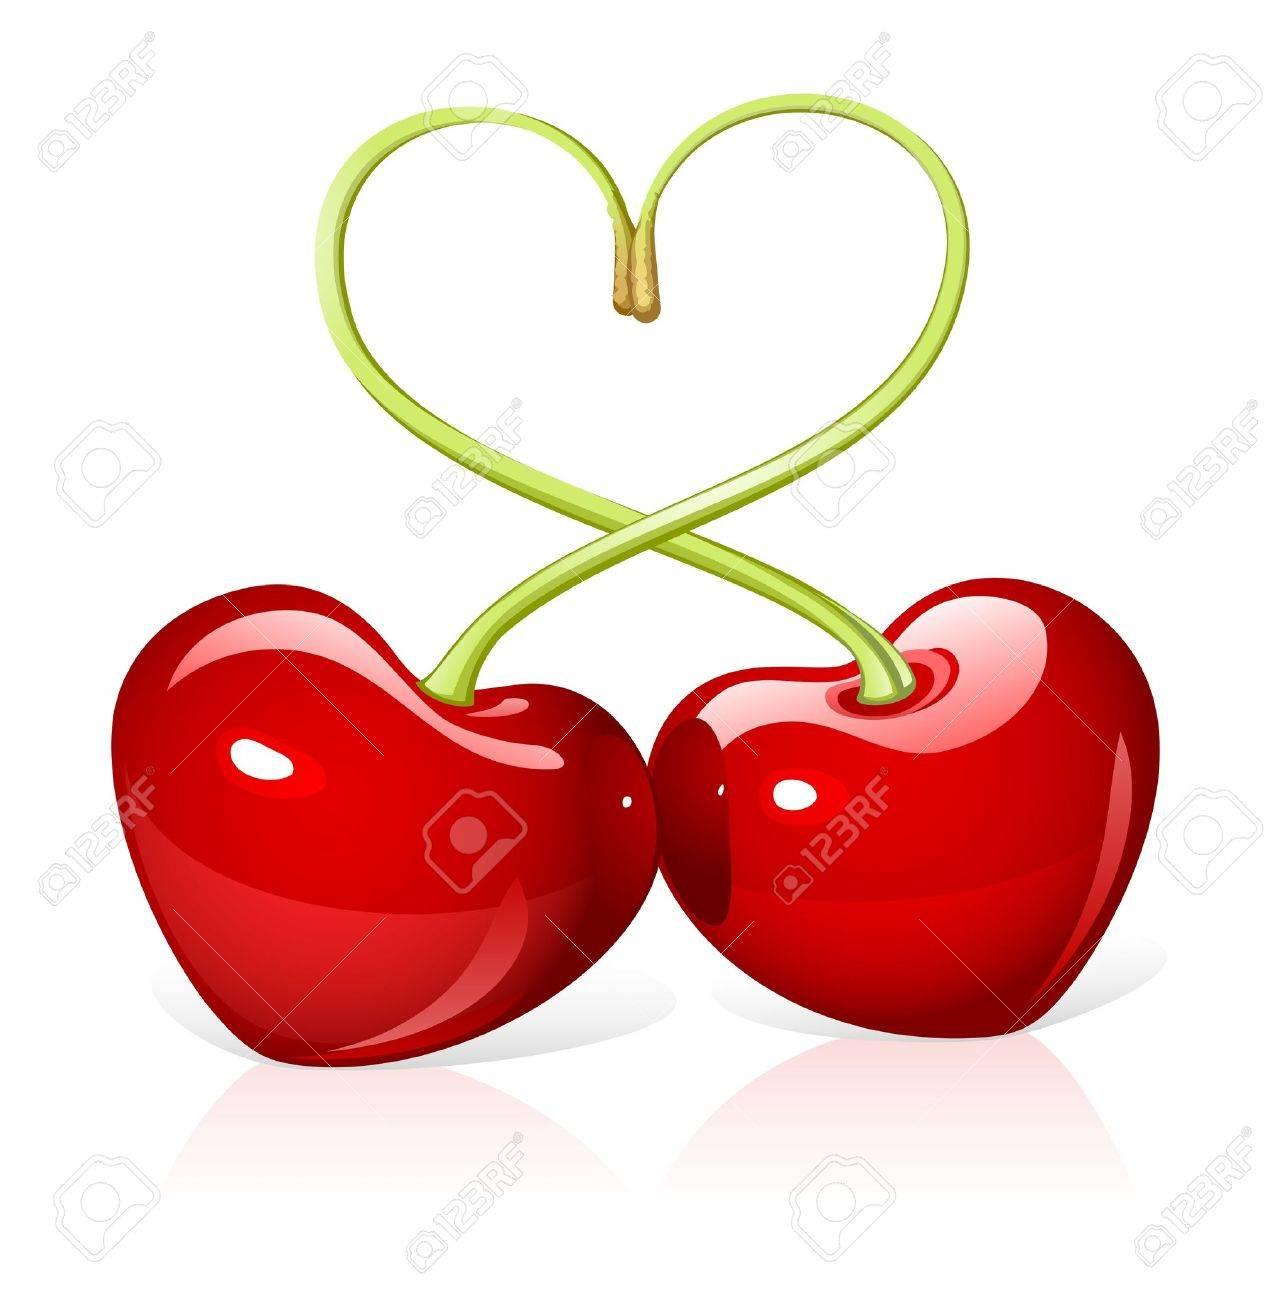 Cherry love royalty free cliparts vectors and stock illustration cherry love stock vector 11172811 biocorpaavc